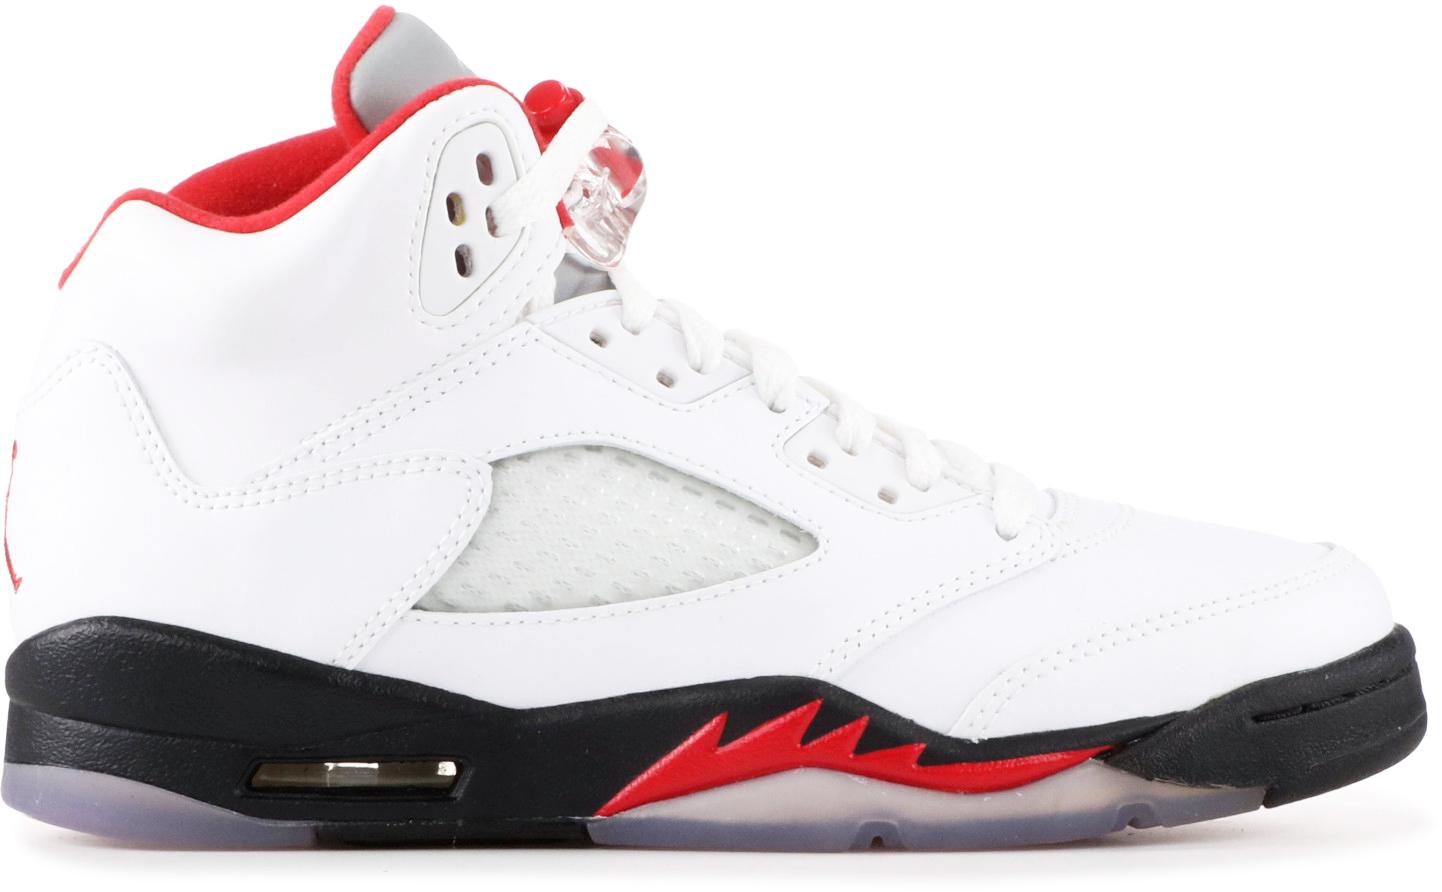 Jordan 5 Retro Fire Red 2013 (GS